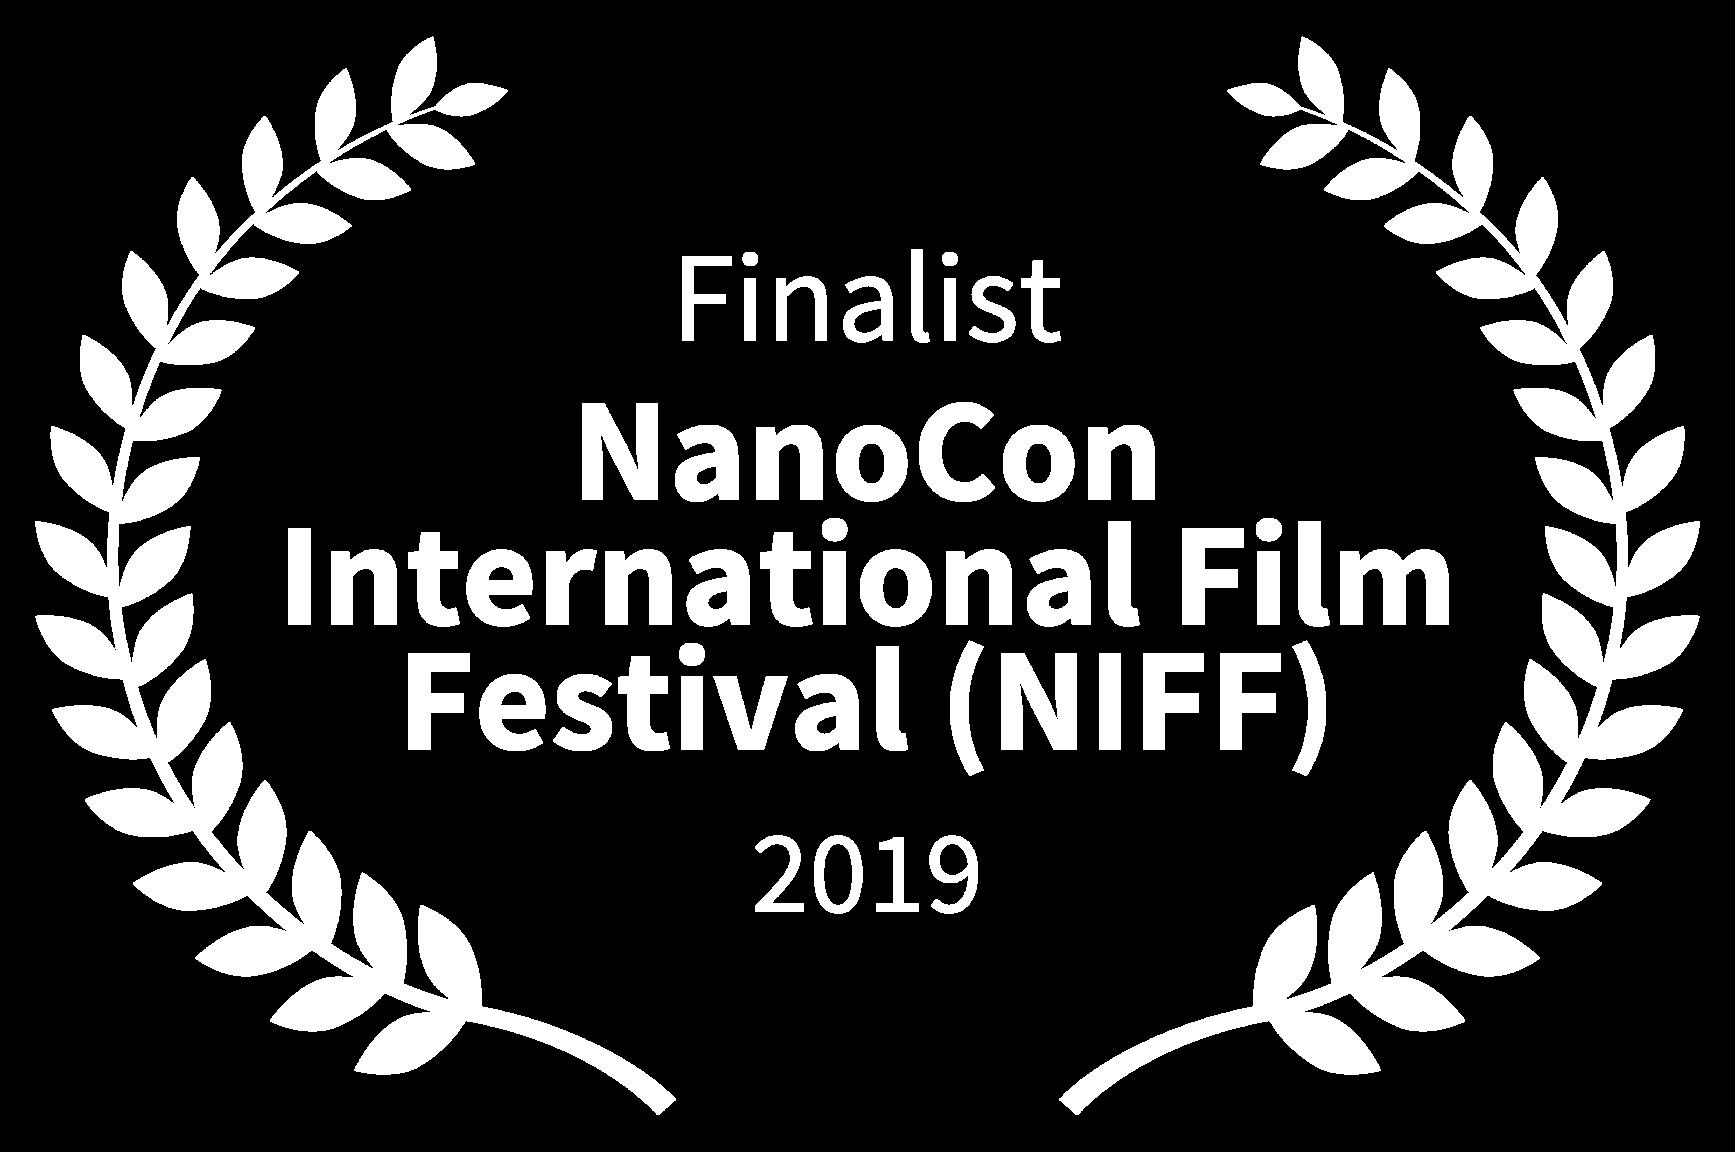 NanoCon International Film Festival NIFFLogo